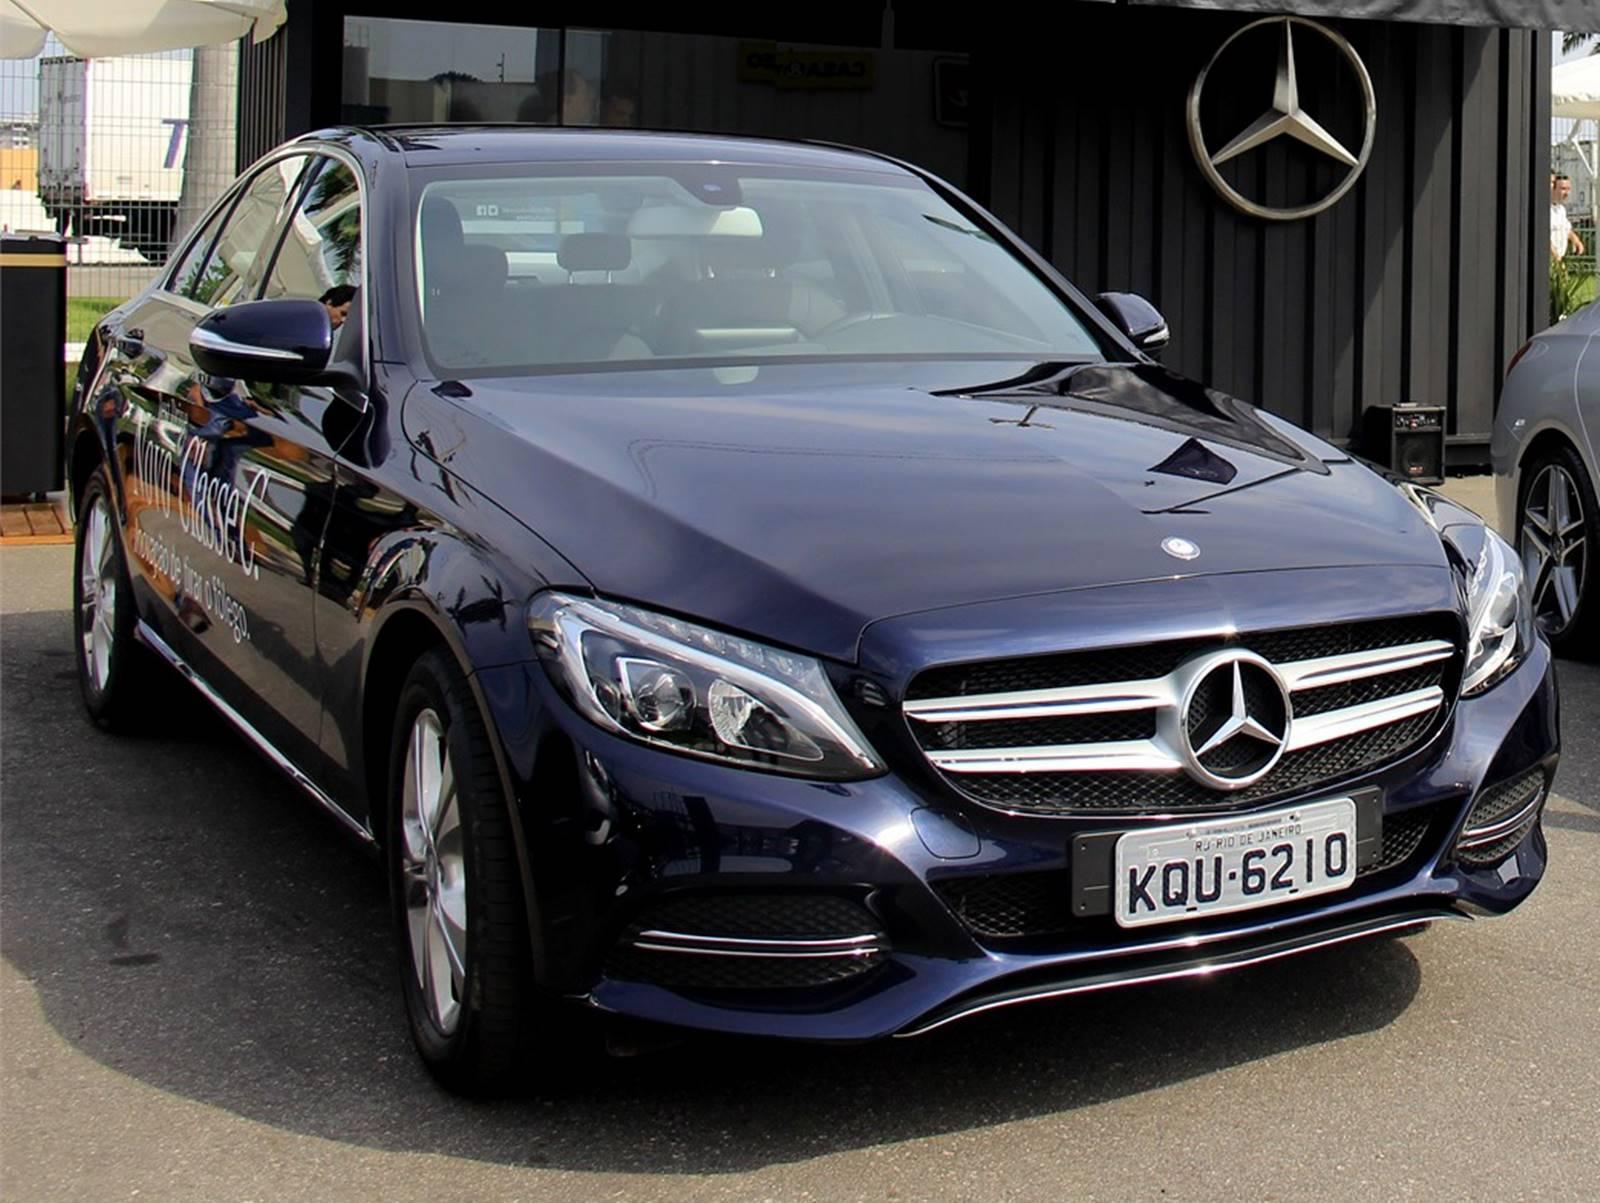 Mercedes benz c180 flex tem desconto de r 13 mil reais for C180 mercedes benz